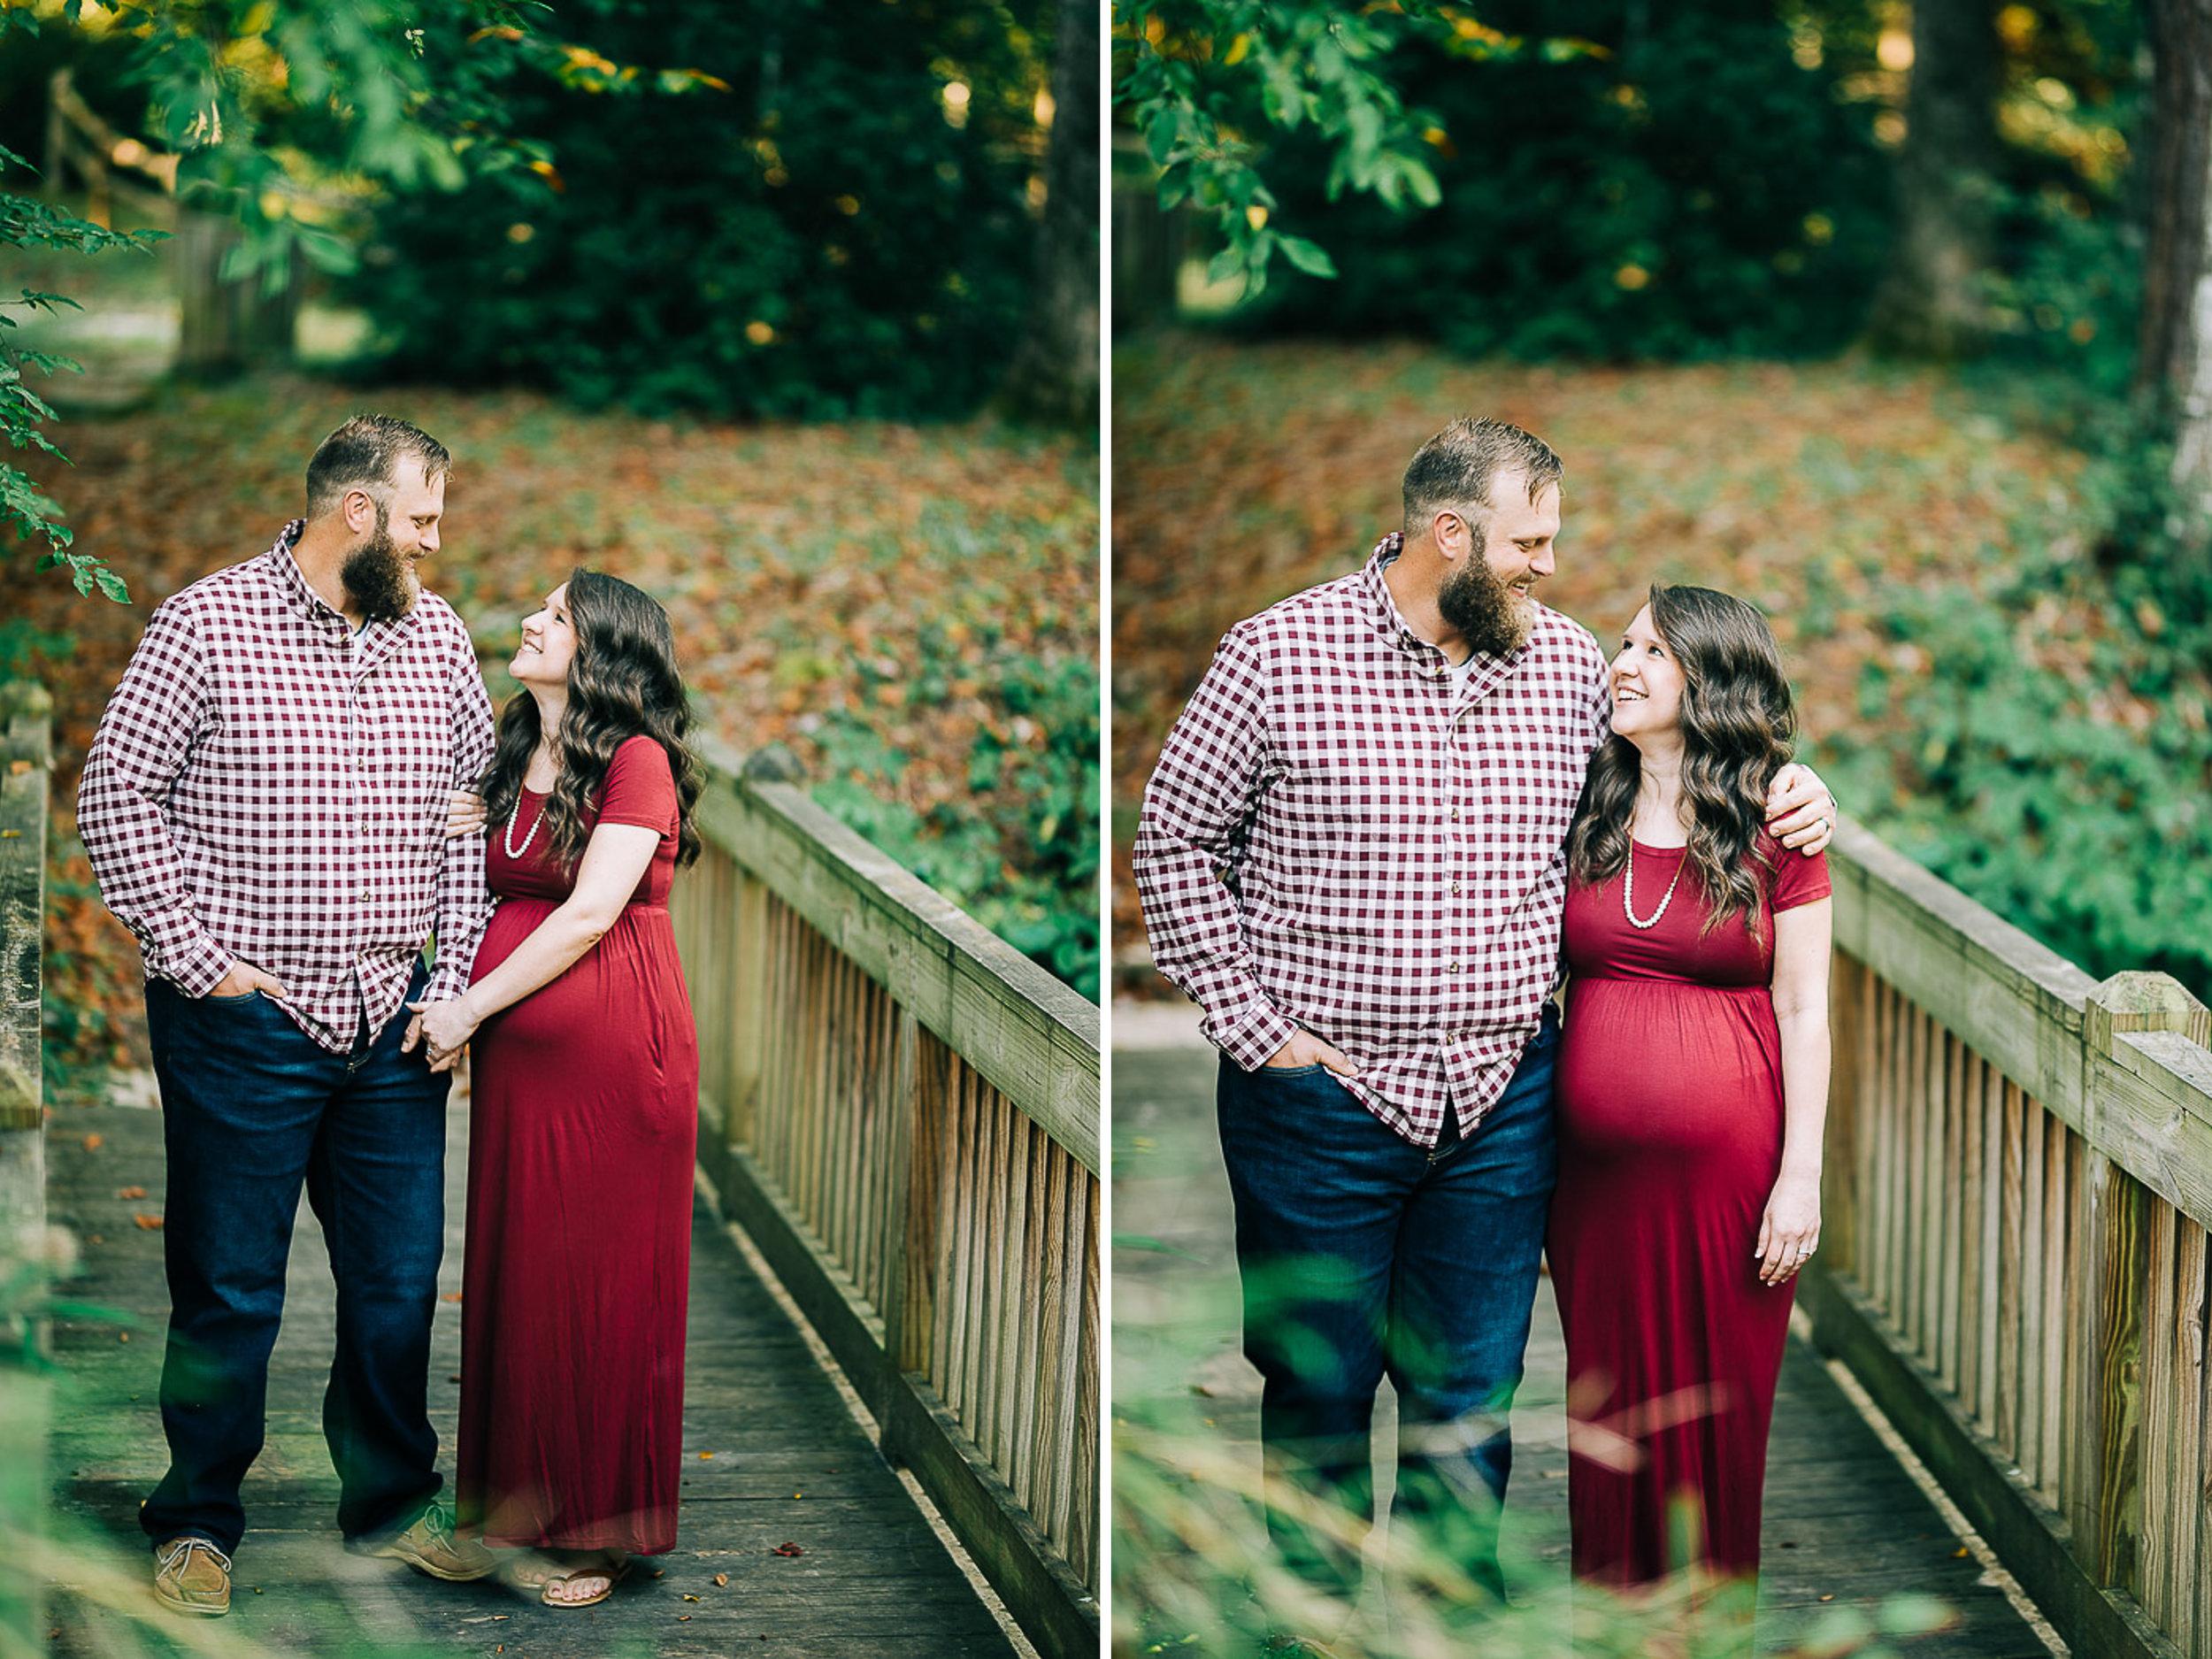 Maternity Portraits, River Maternity Portraits, Summer Mast Photography, Baby Bump 03.jpg